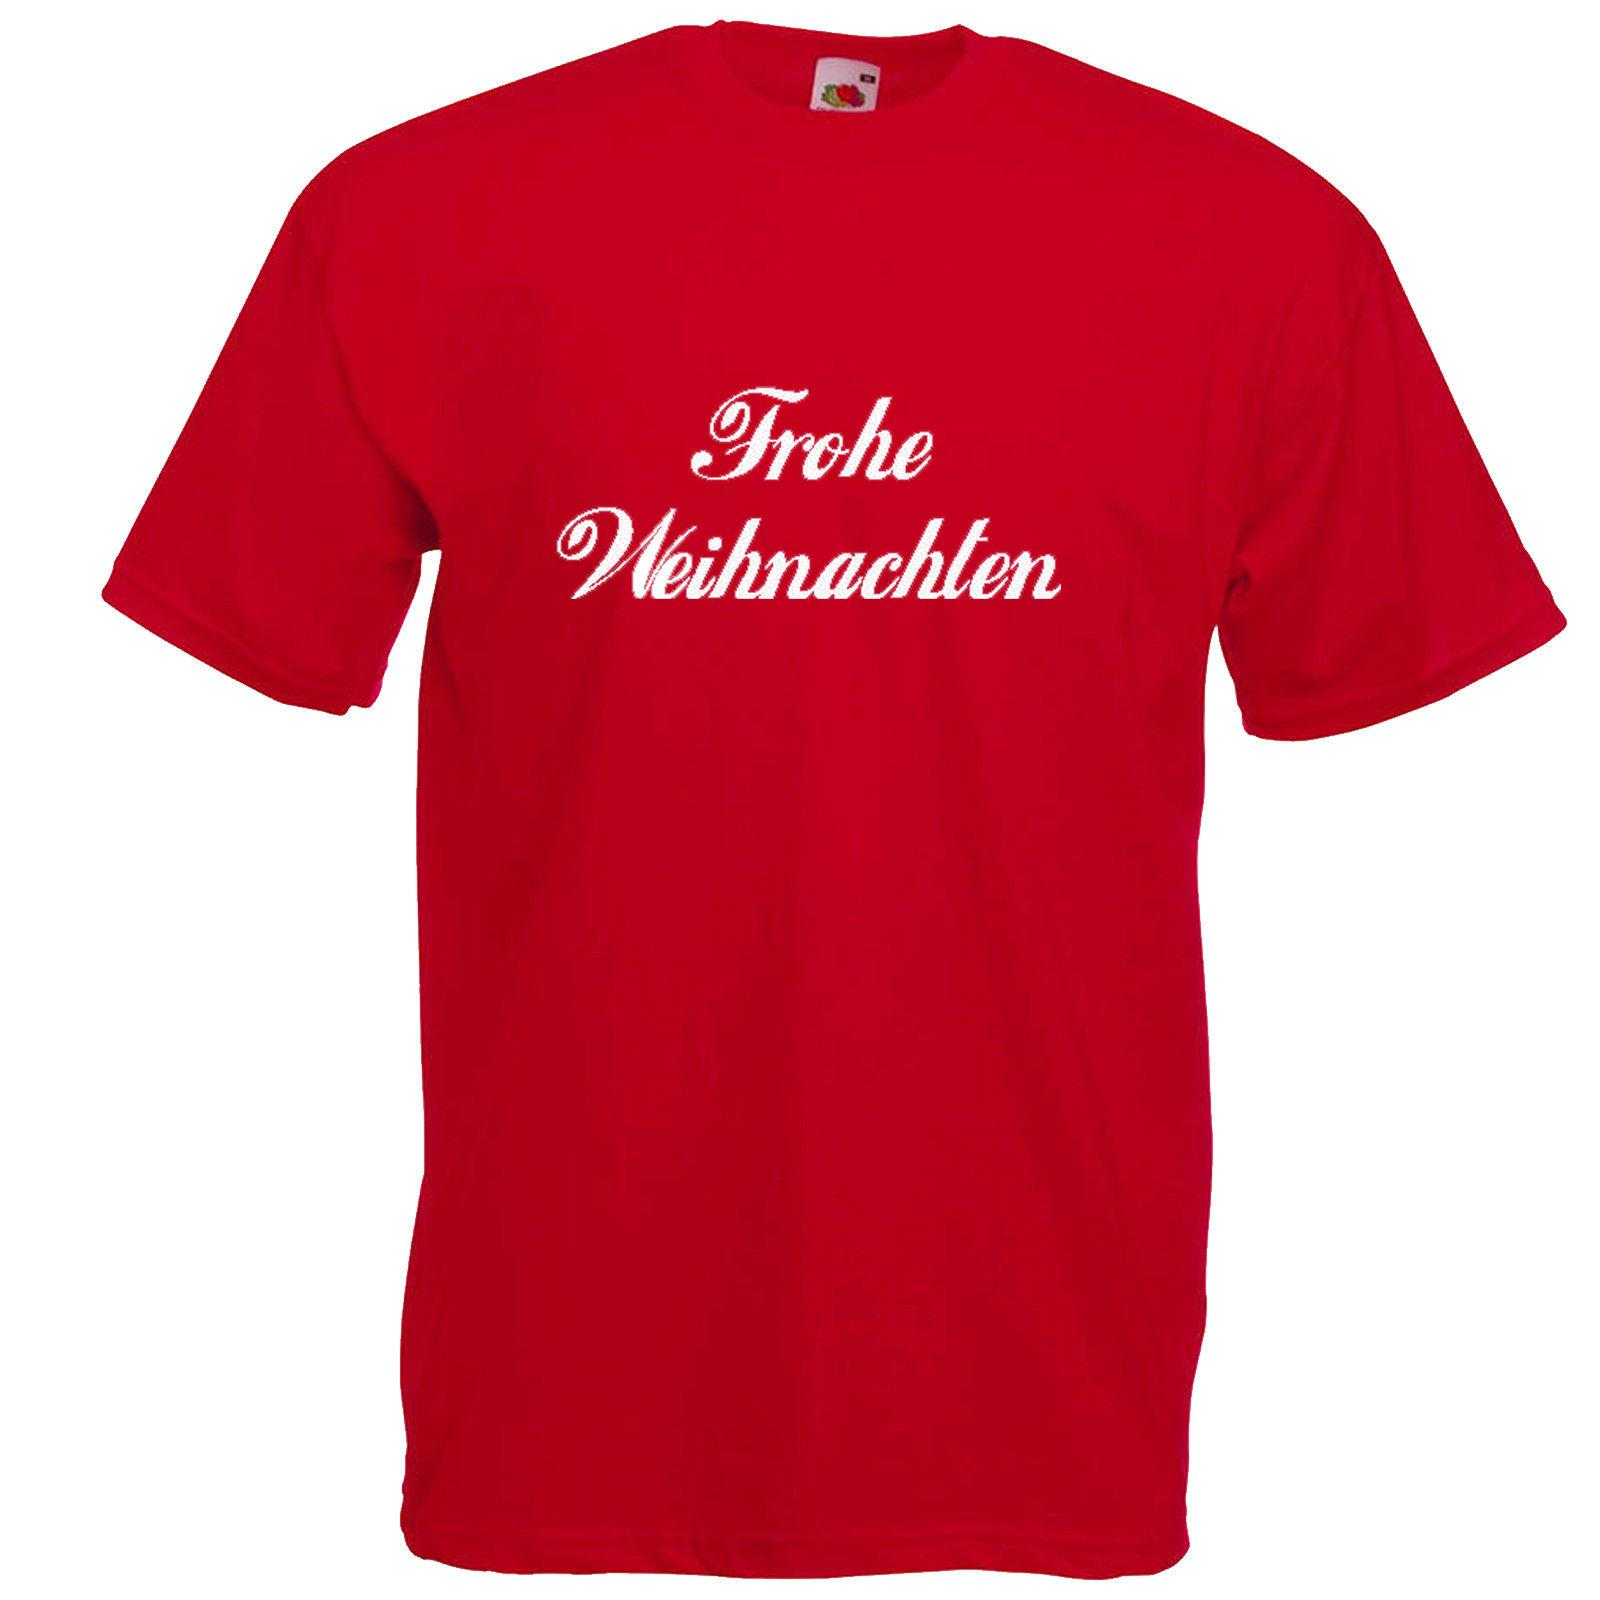 Weihnachten Funny.Frohe Weihnachten T Shirt Bis 5xl Party Funshirt Mottoshirt Christmas Funny Free Shipping Unisex Casual Gift